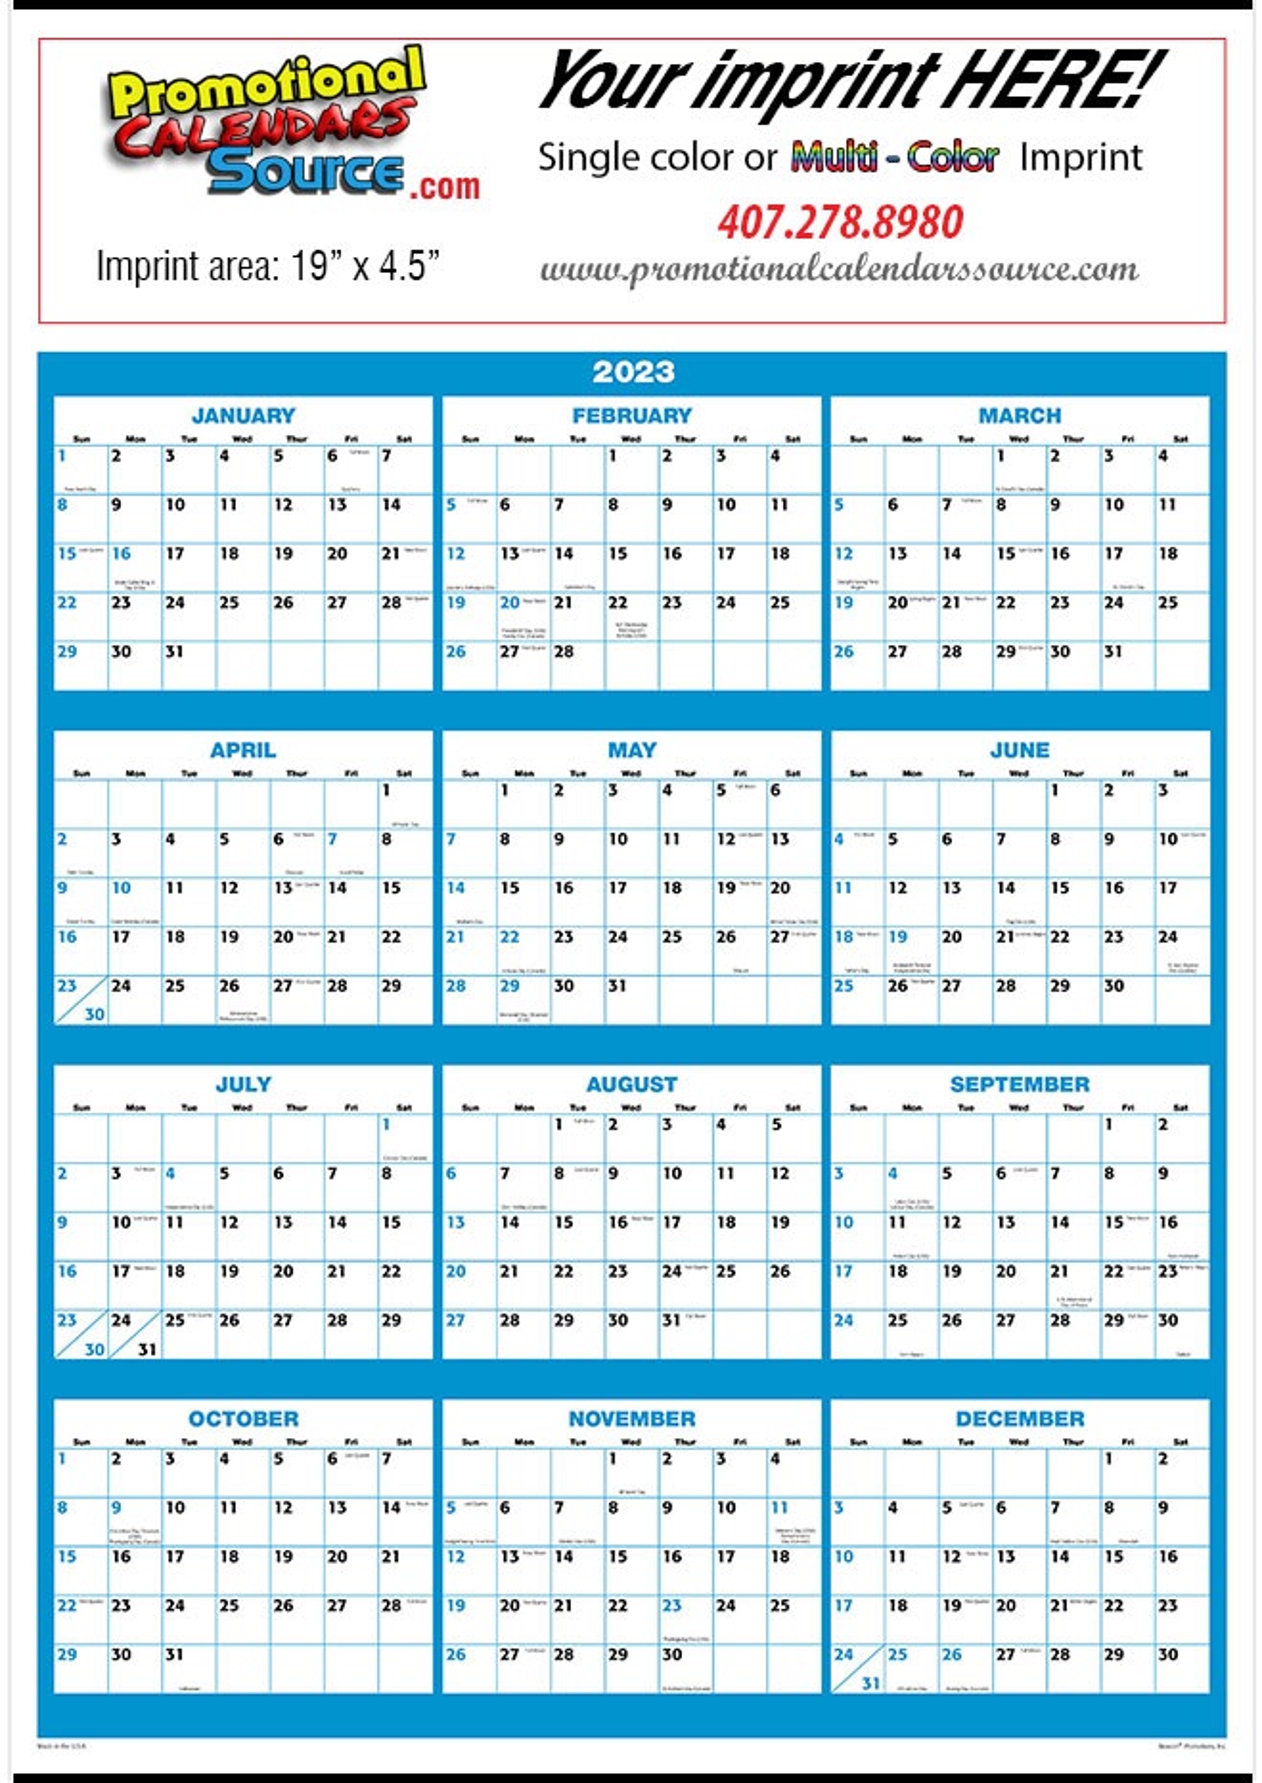 Calendar Year View : Full year view poster calendar blue black